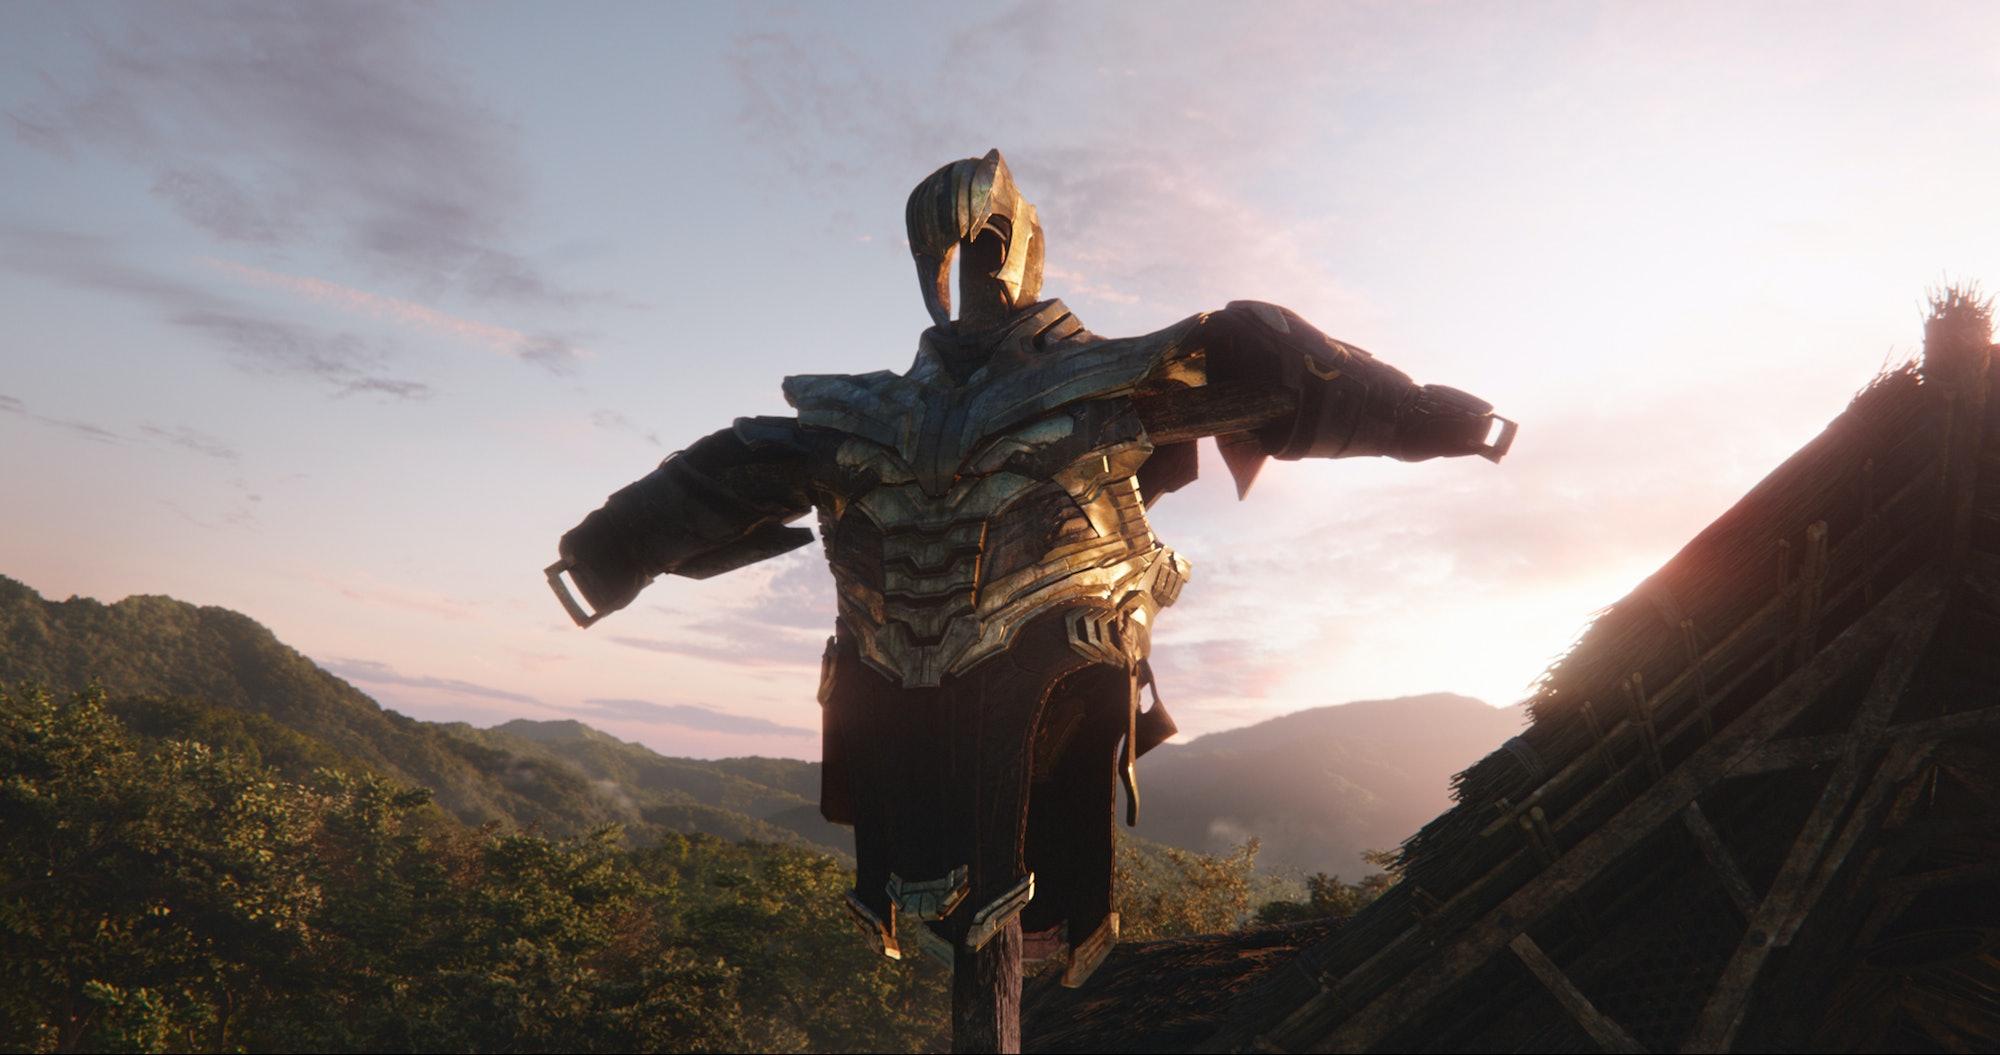 Avengers: Endgame Thanos armor